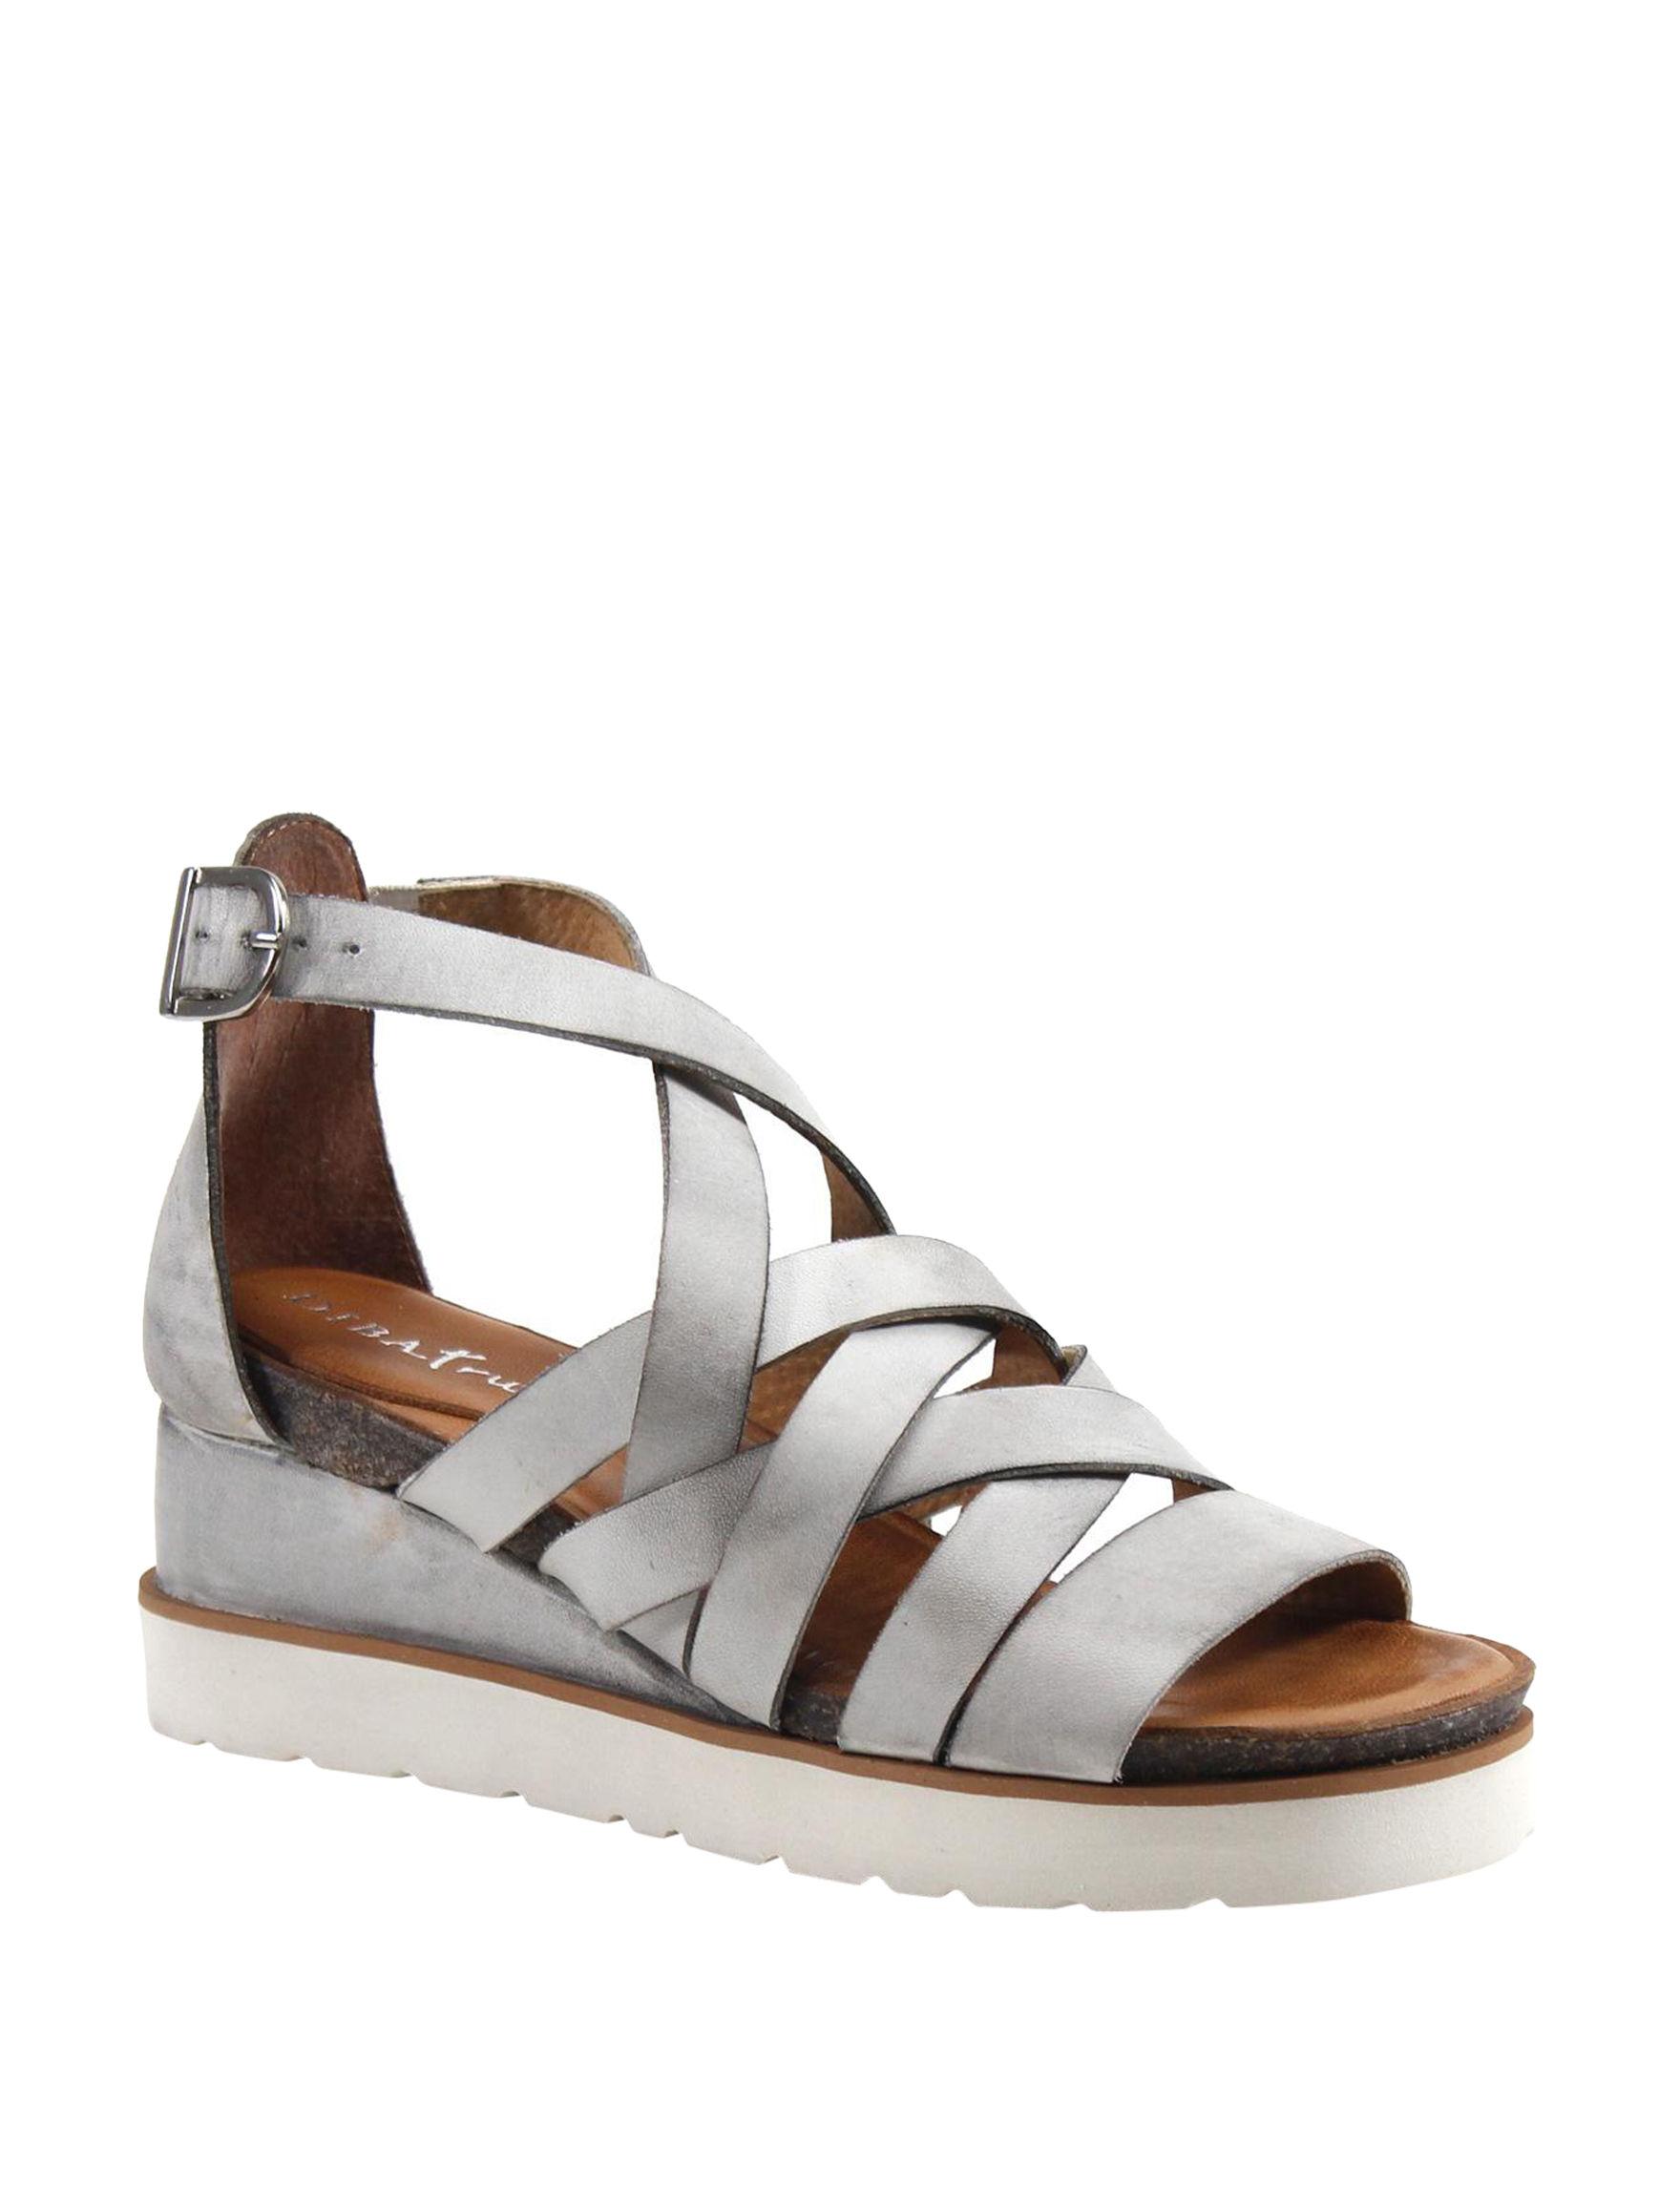 Diba True White Wedge Sandals